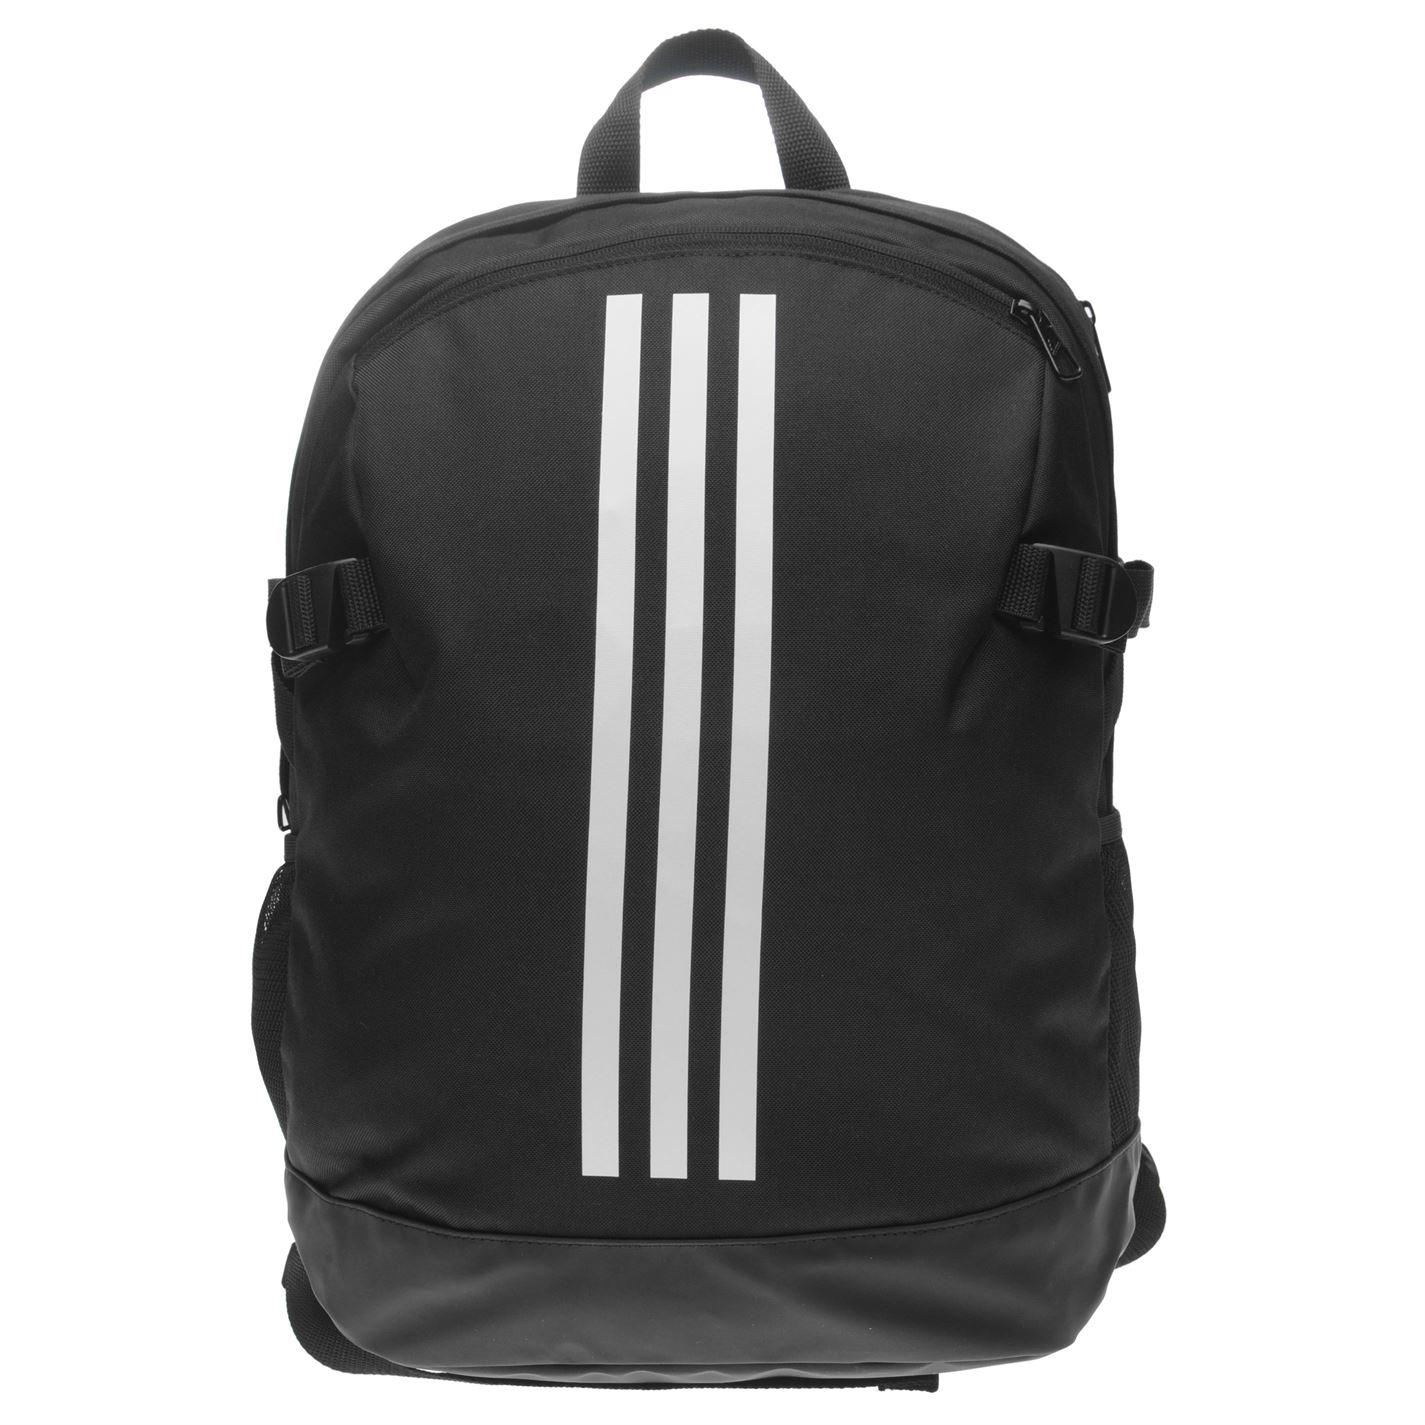 adidas BP Power IV M BR5864 Backpack Black for sale online  1c57569c644c8